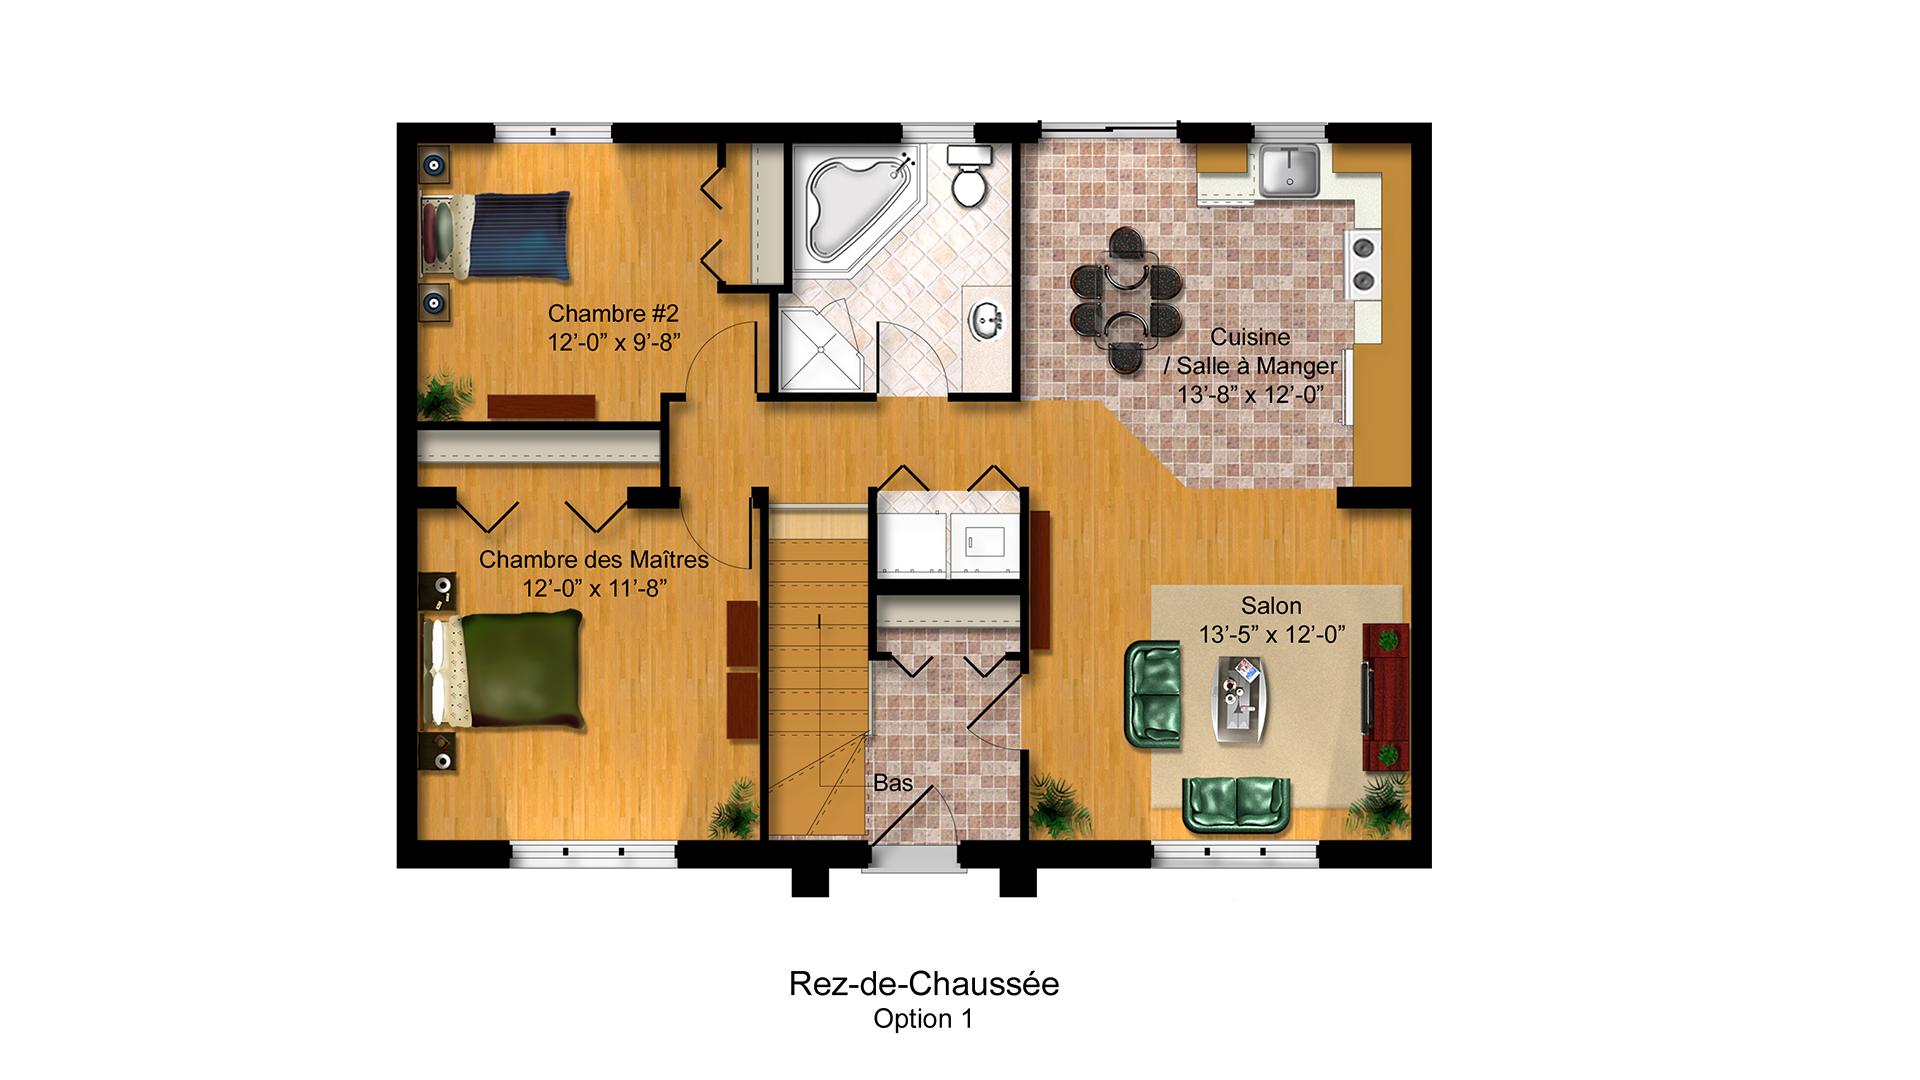 provence-plan-plancher-option3